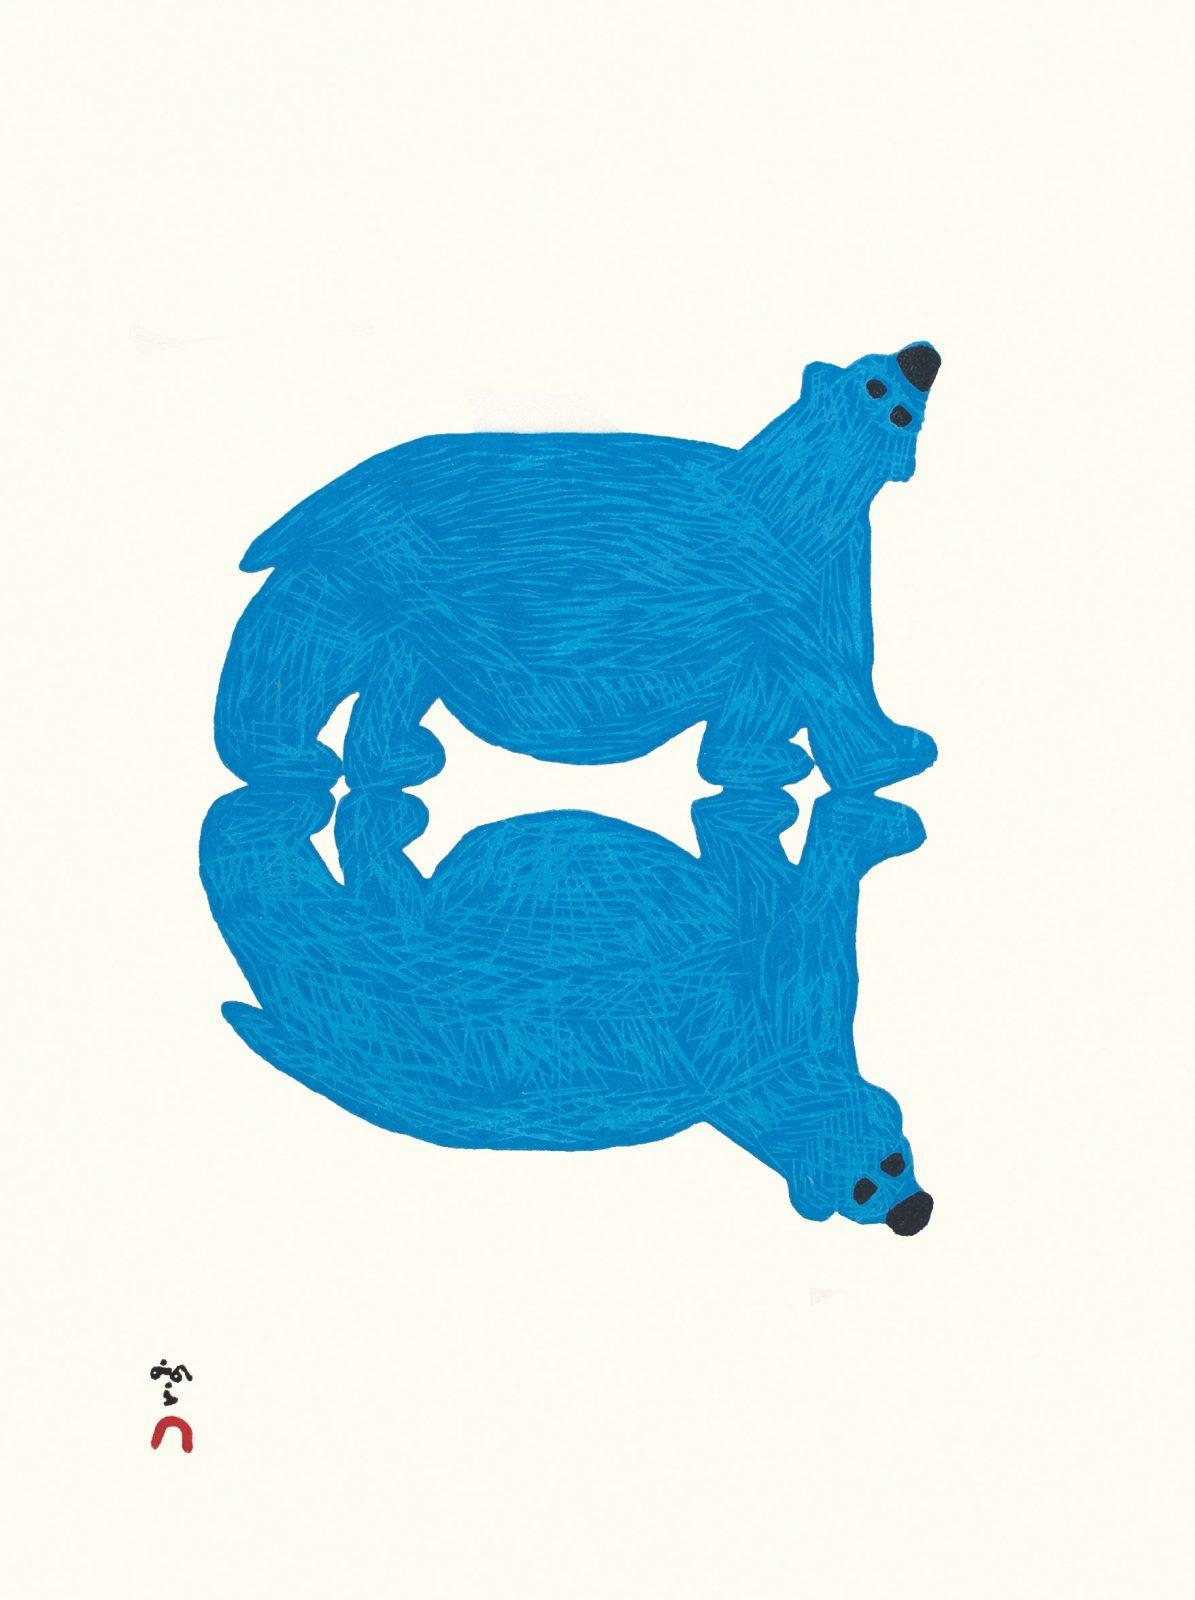 SAIMAIYU AKESUK Bear's Reflection Cape Dorset Print 2021